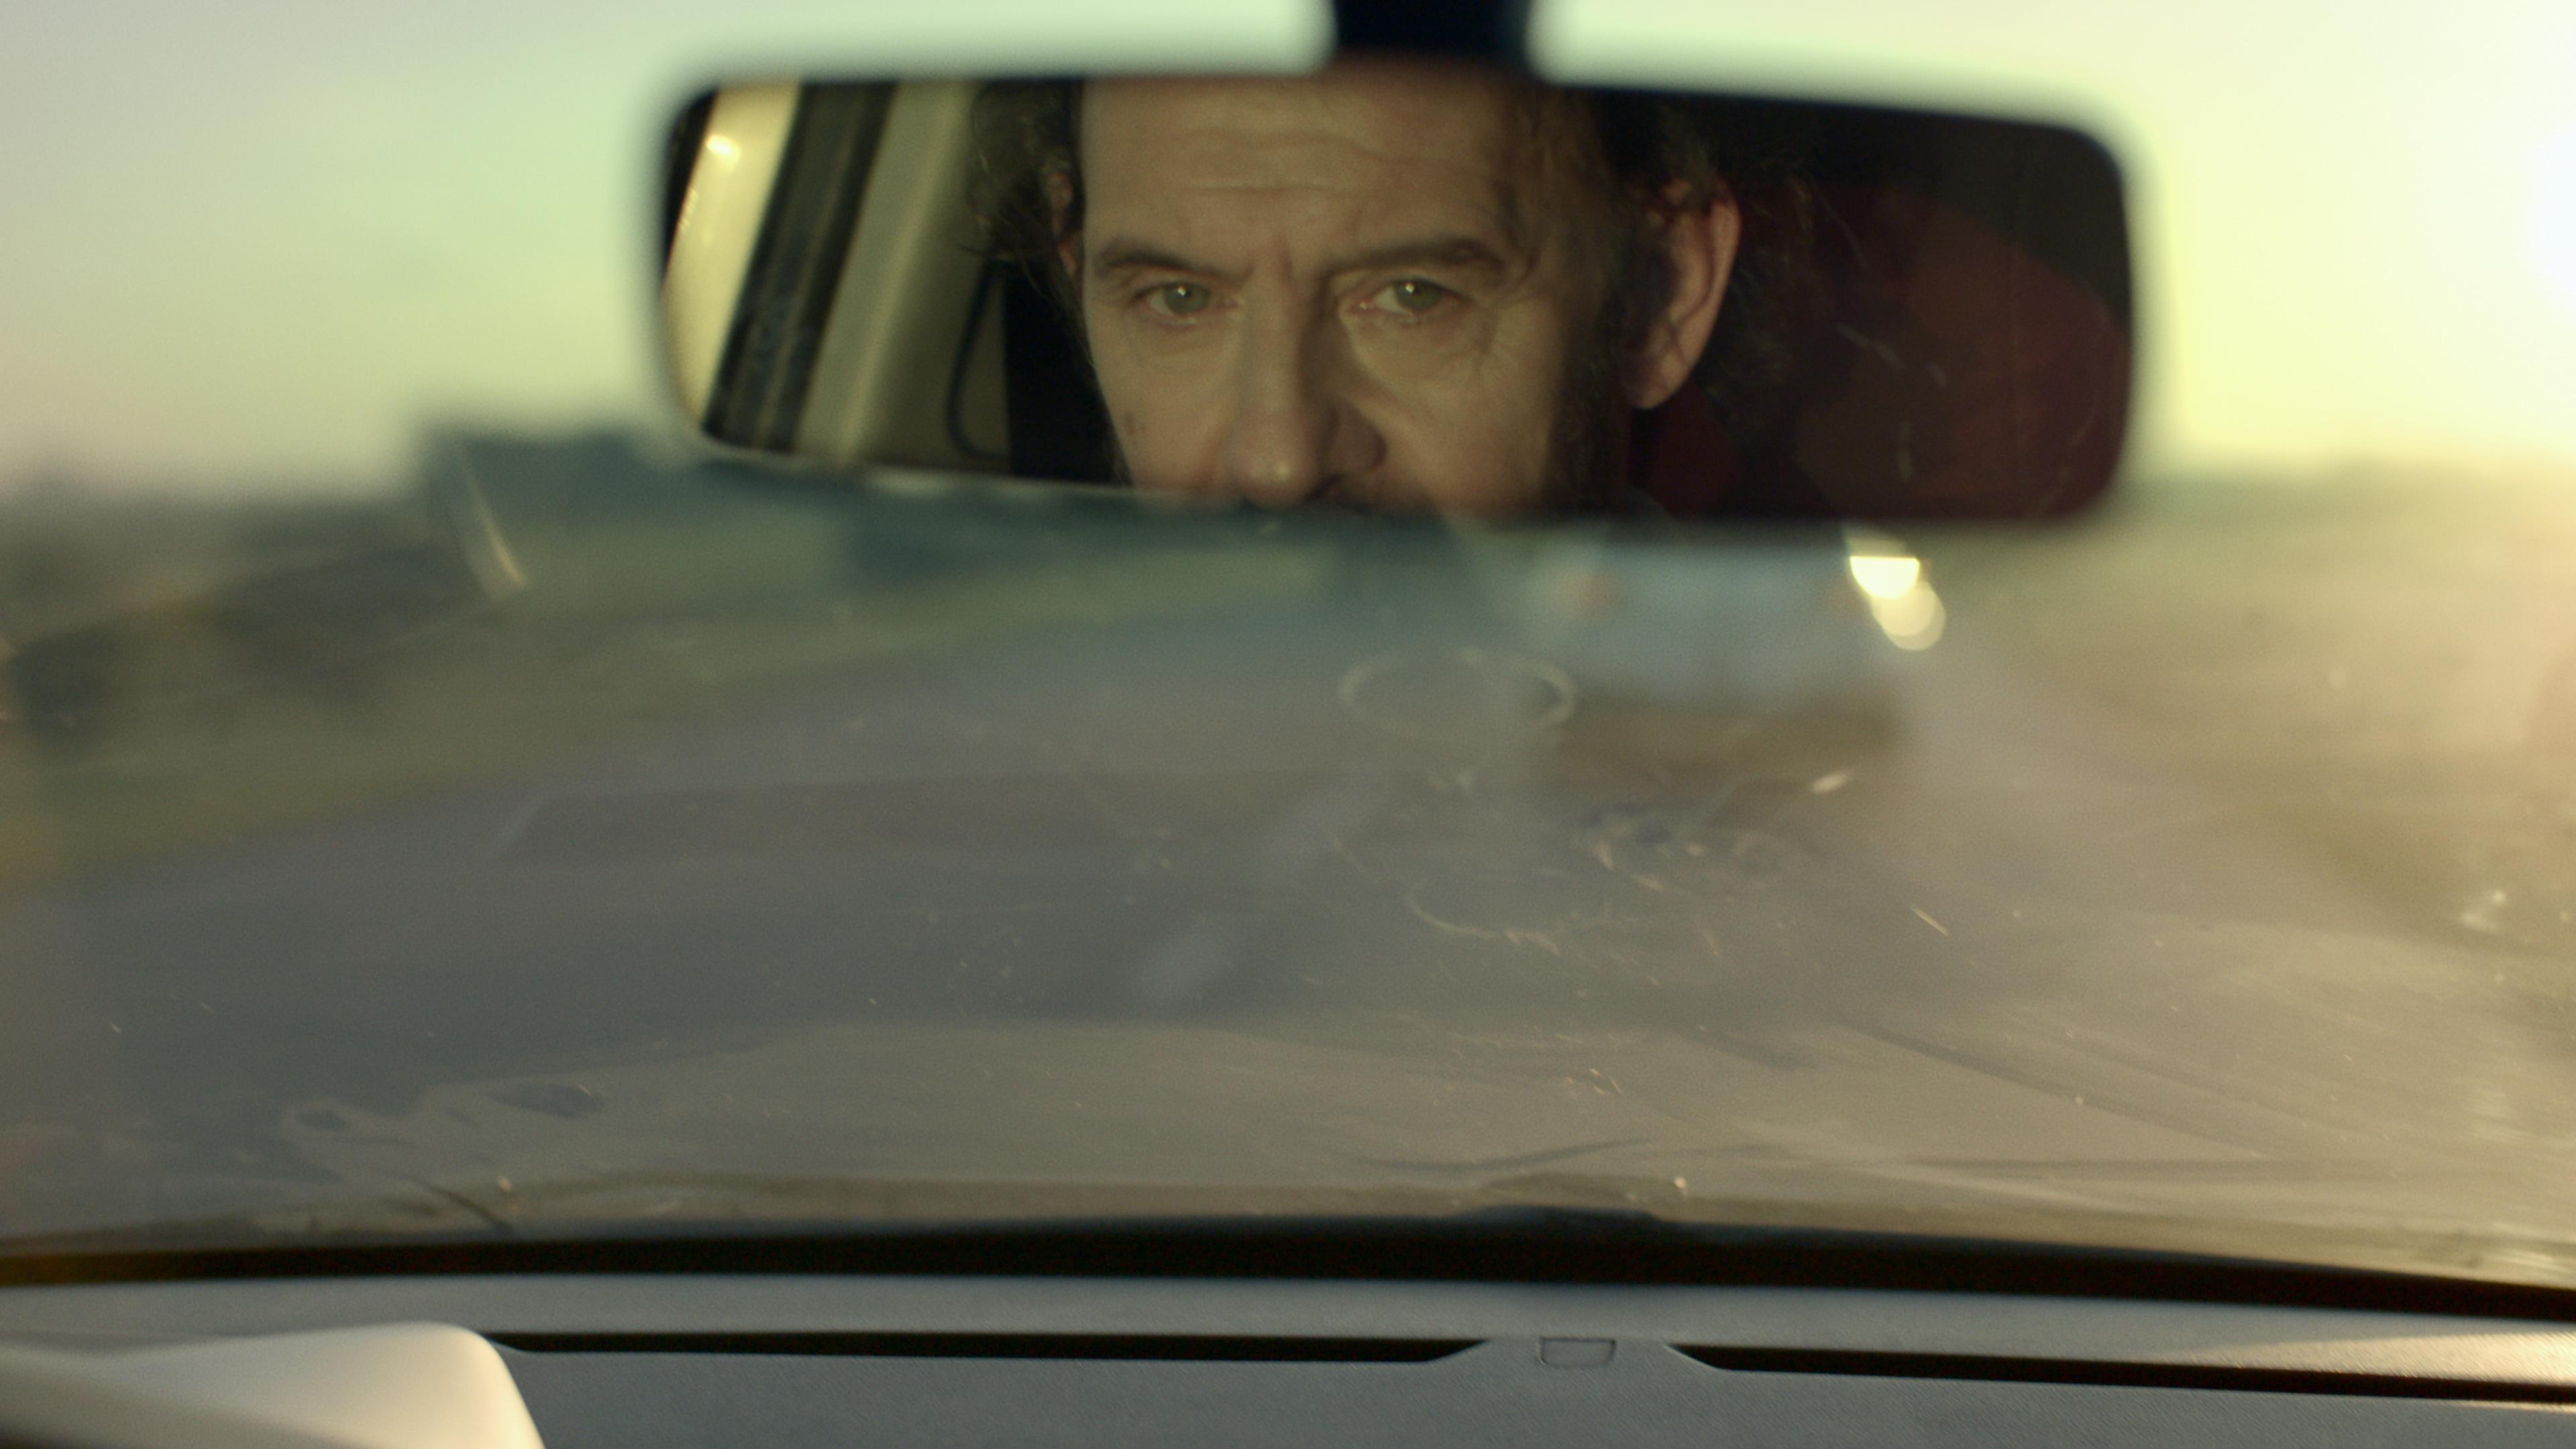 Imagen extraída del cortometraje Rabia, de Romina Tamburello.